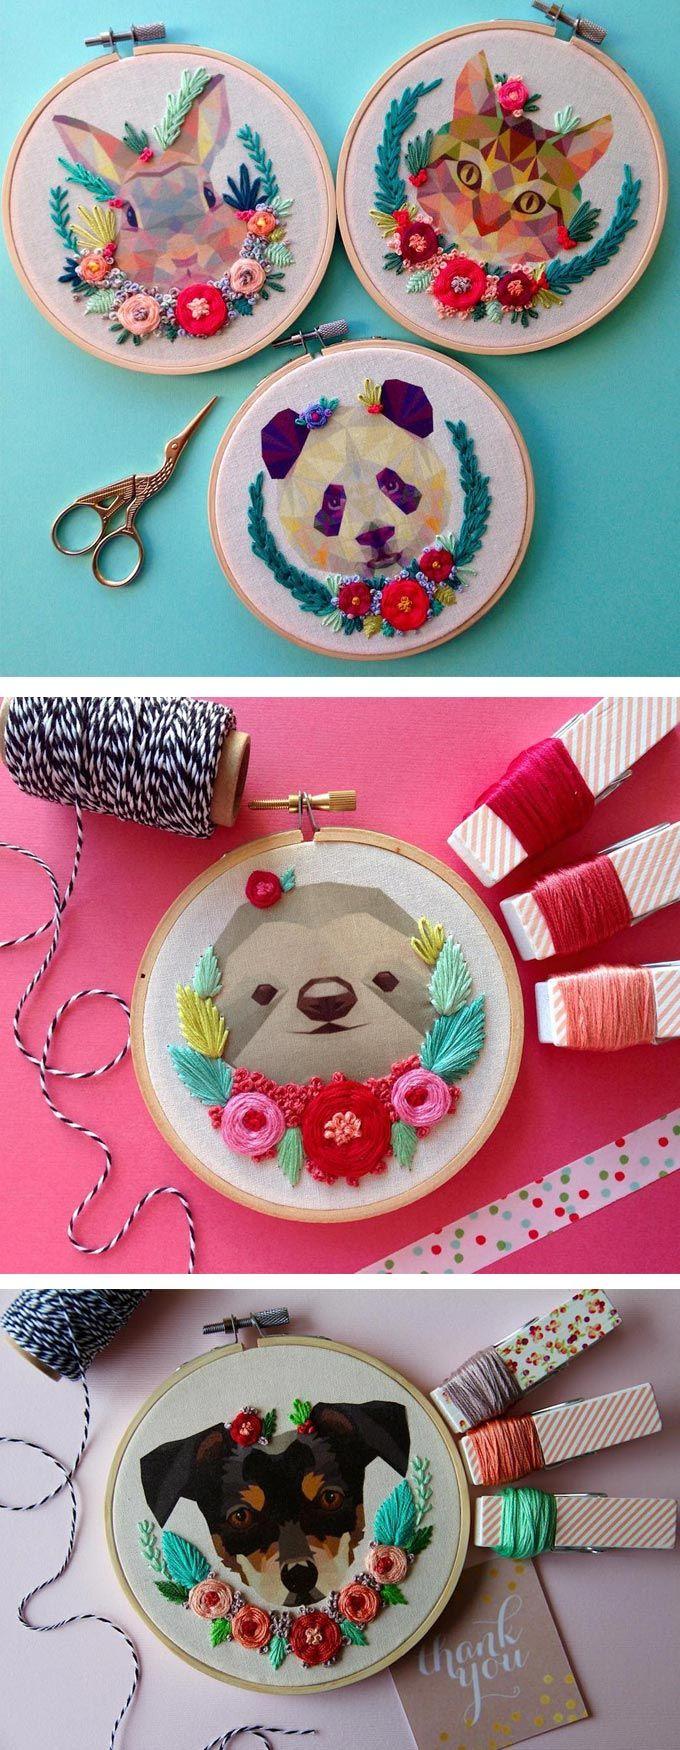 Elmer Food Beat Salle De Bain ~ the 1041 best bricolage images on pinterest cross stitch